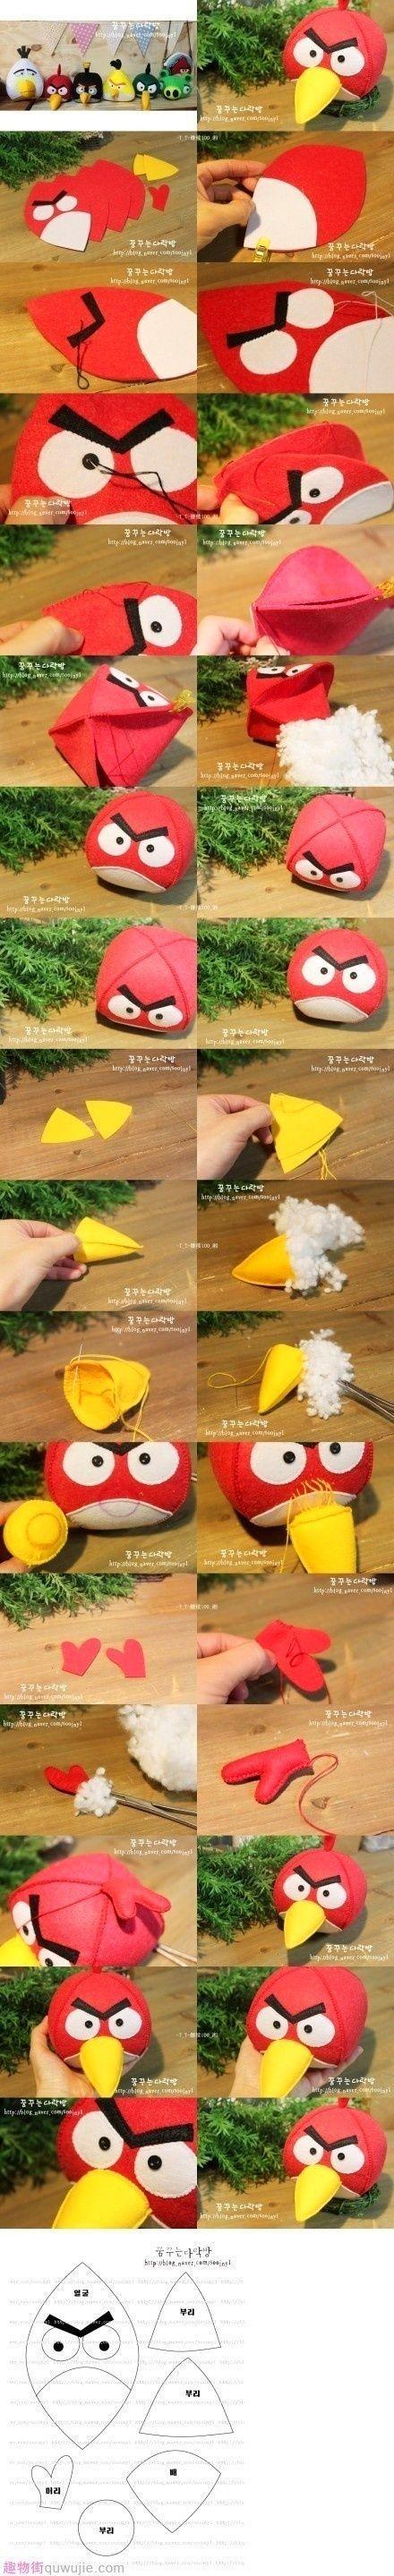 DIY Angry Bird Doll